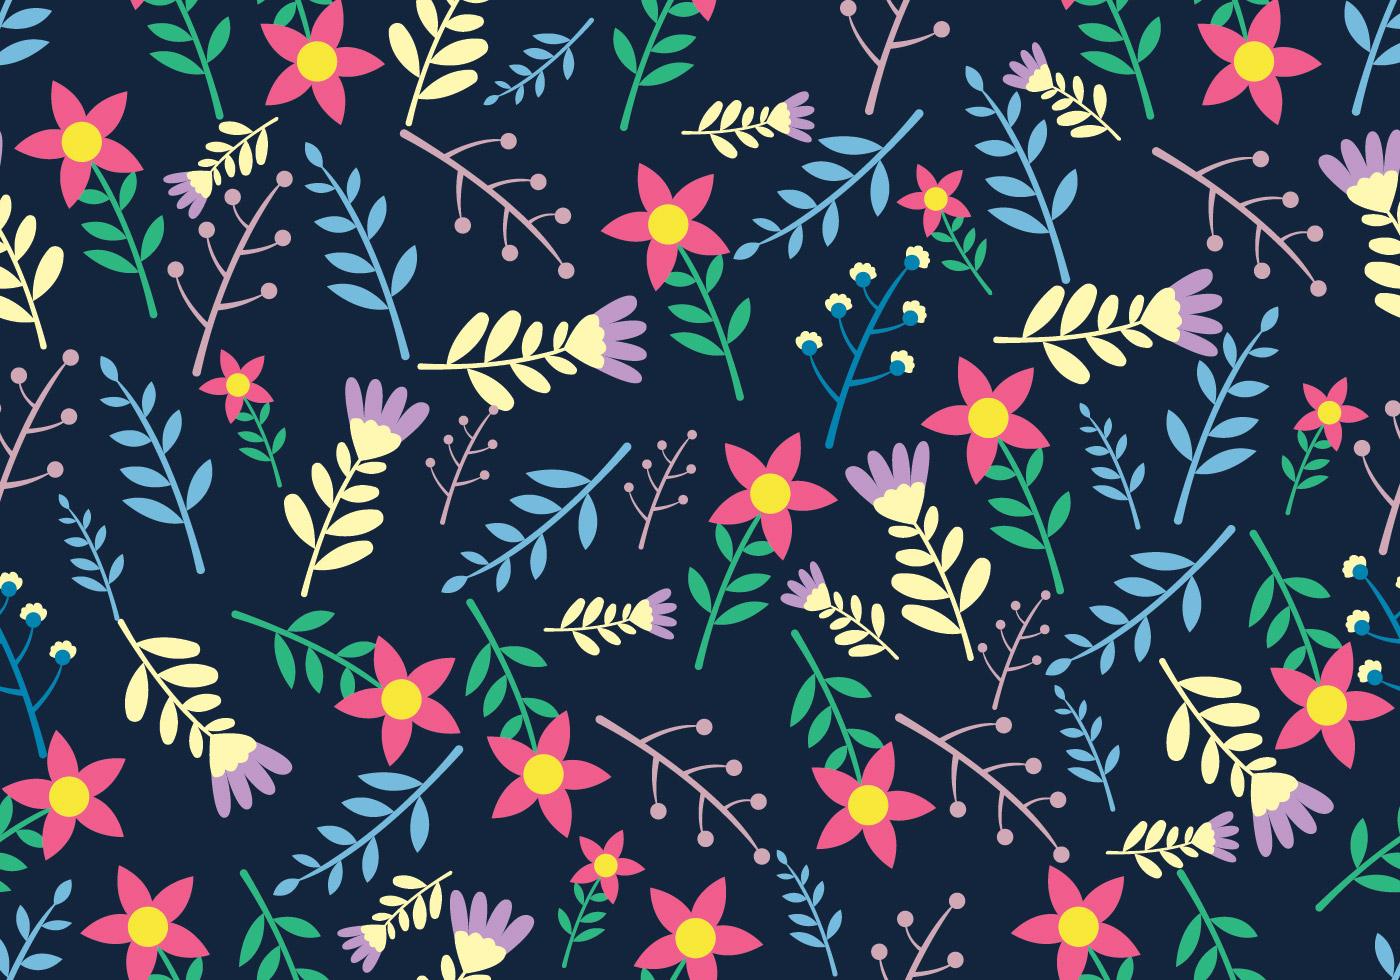 Simple Floral Wallpaper